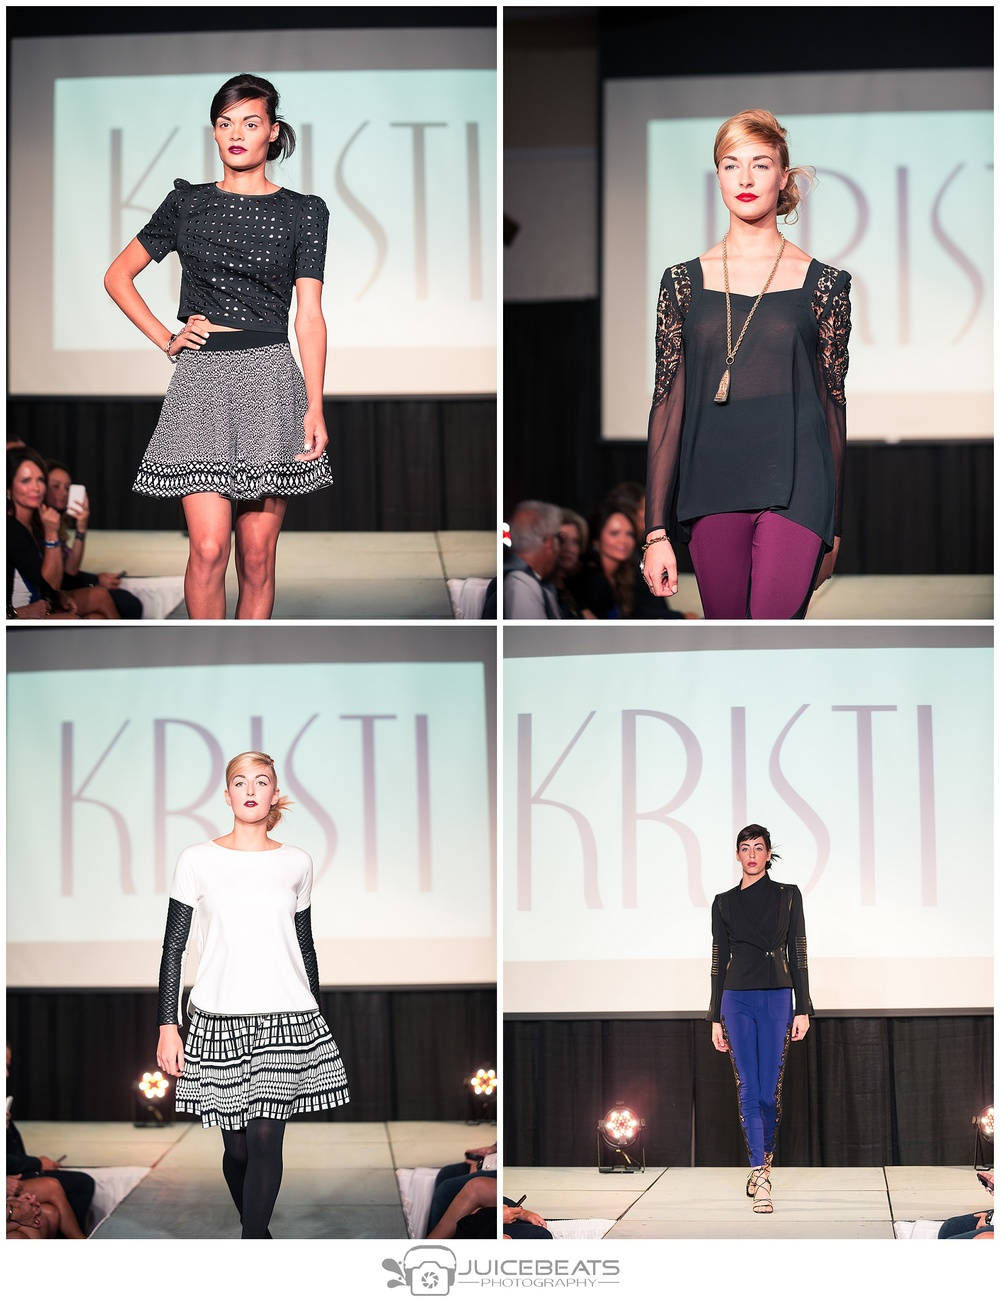 Fashion Show Runway-4_Blog.jpg